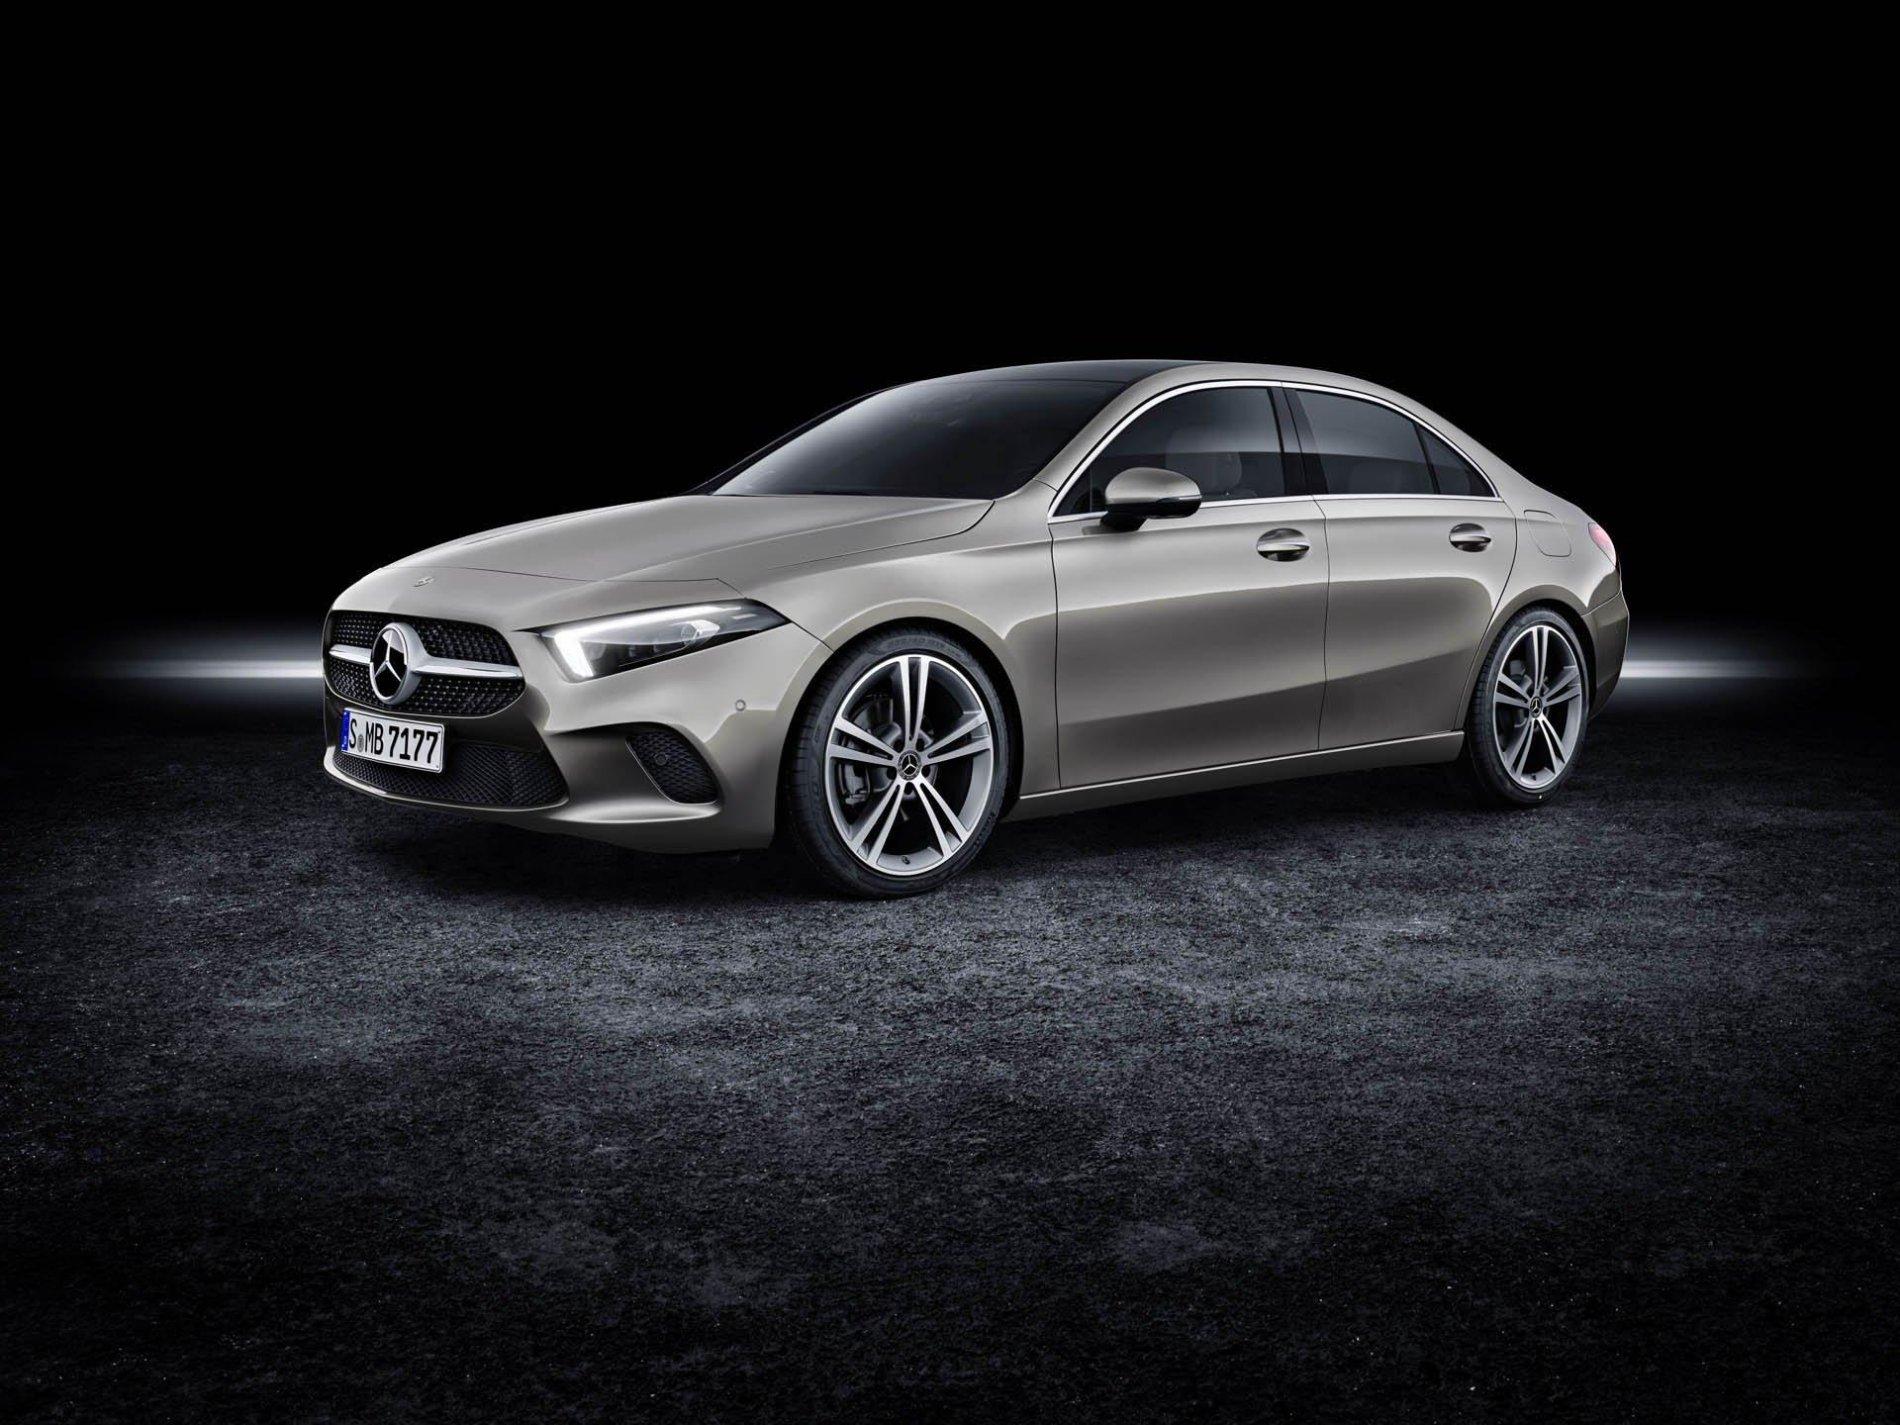 Mercedes A-Class Sedan - Mercedes A-Class Sedan